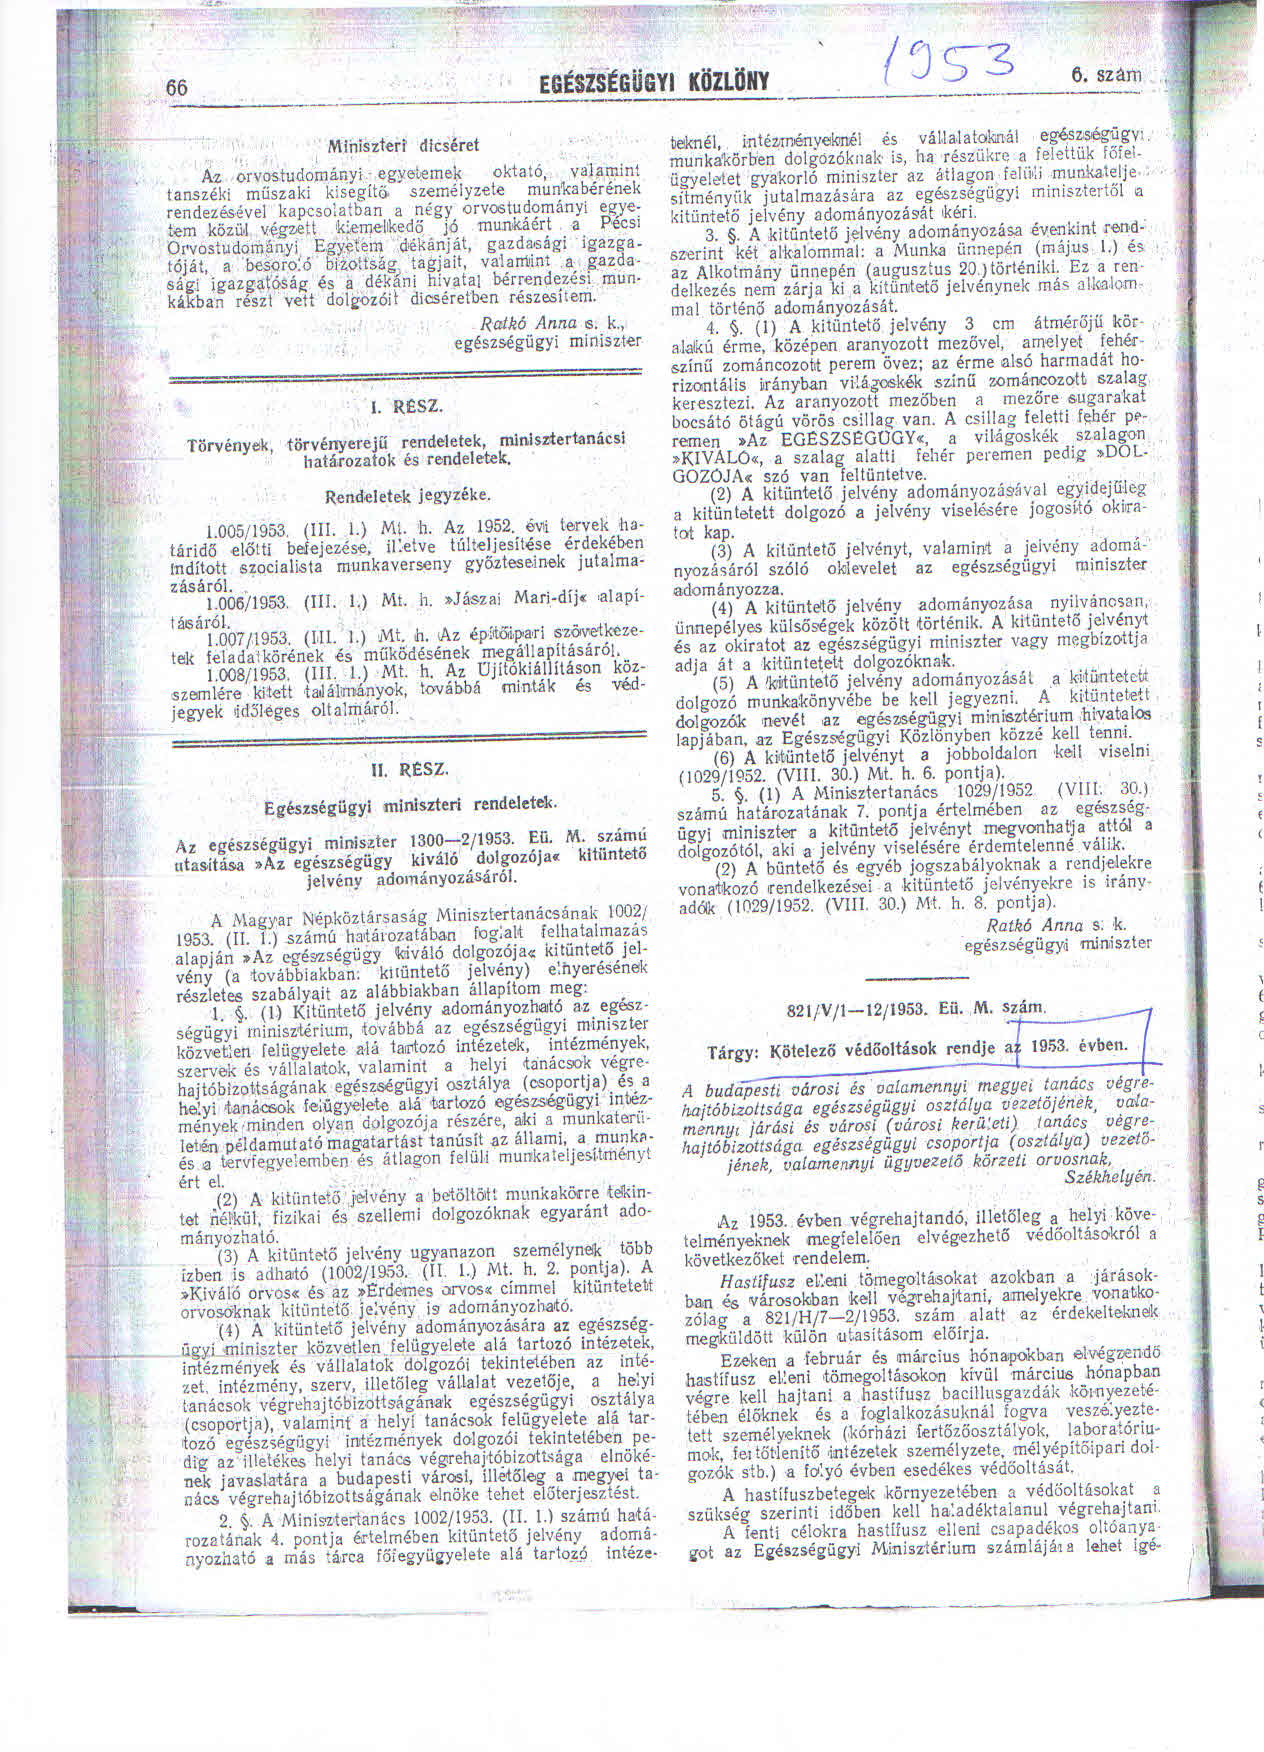 kotelezo_vedooltasok_1953_1.jpg